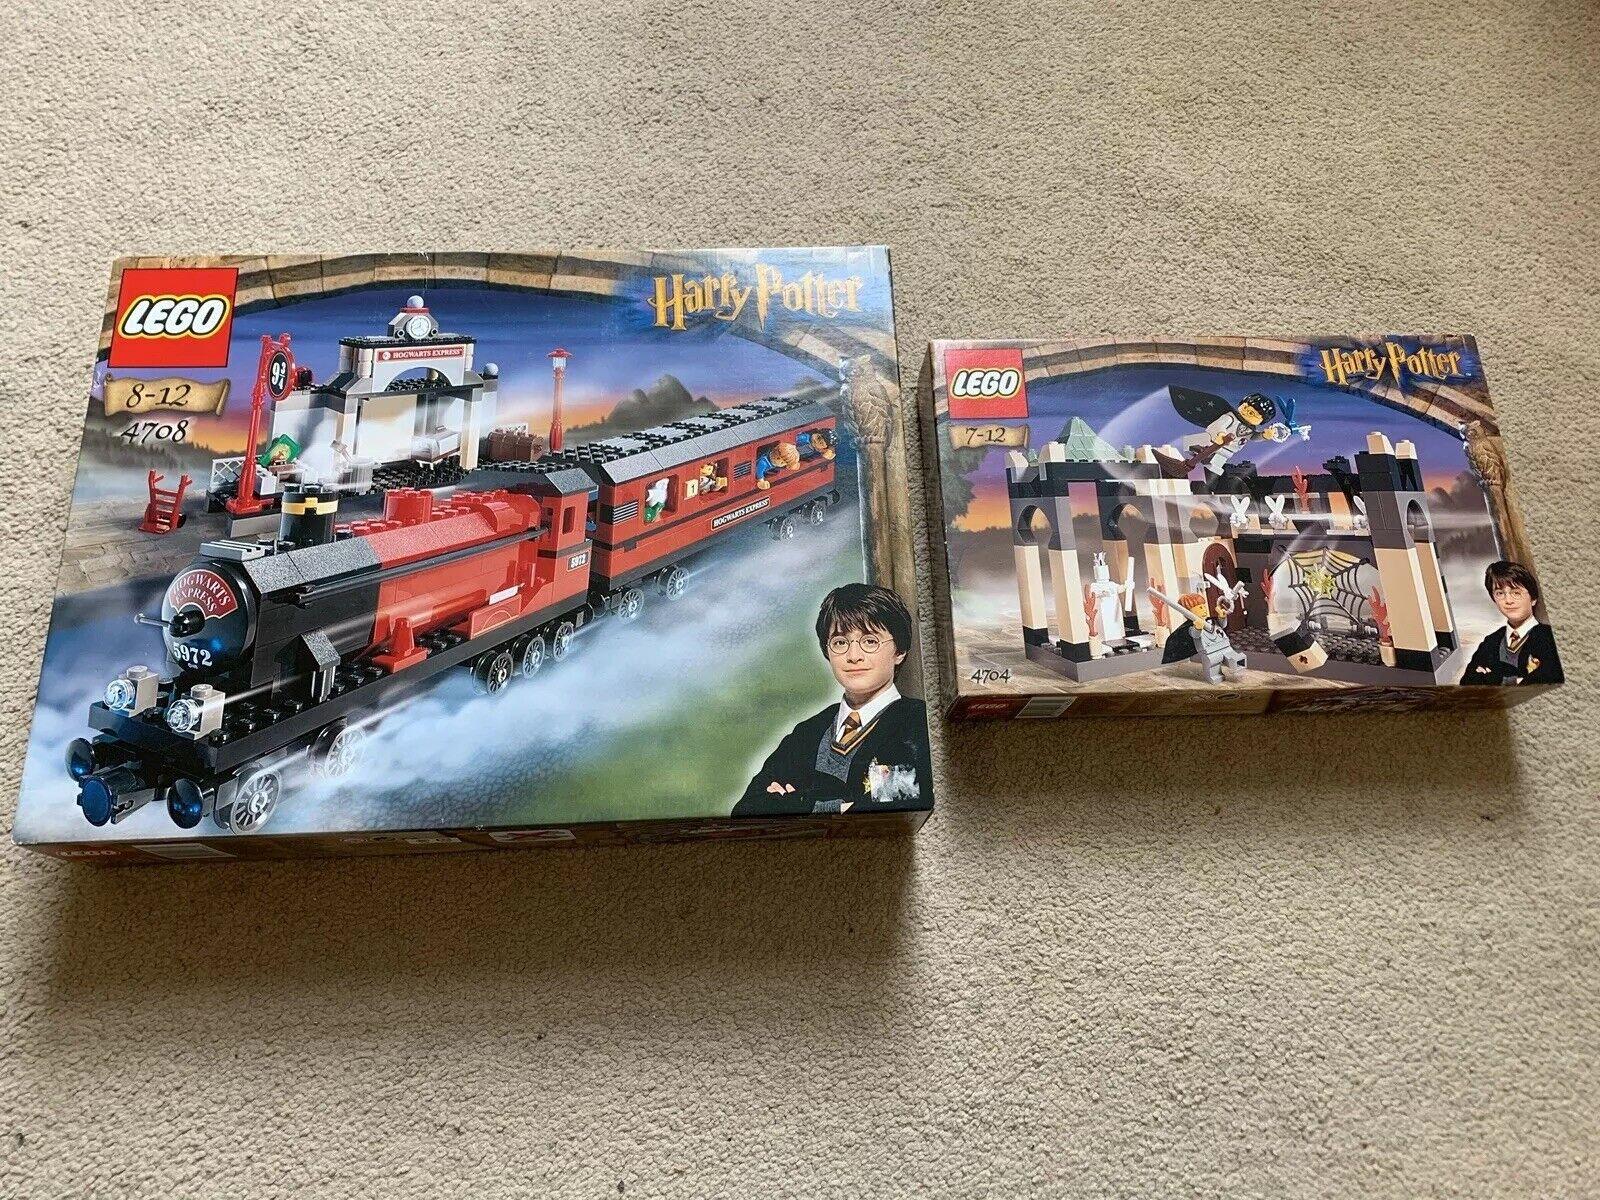 Lego Harry Potter 4704 4708 Nuevo